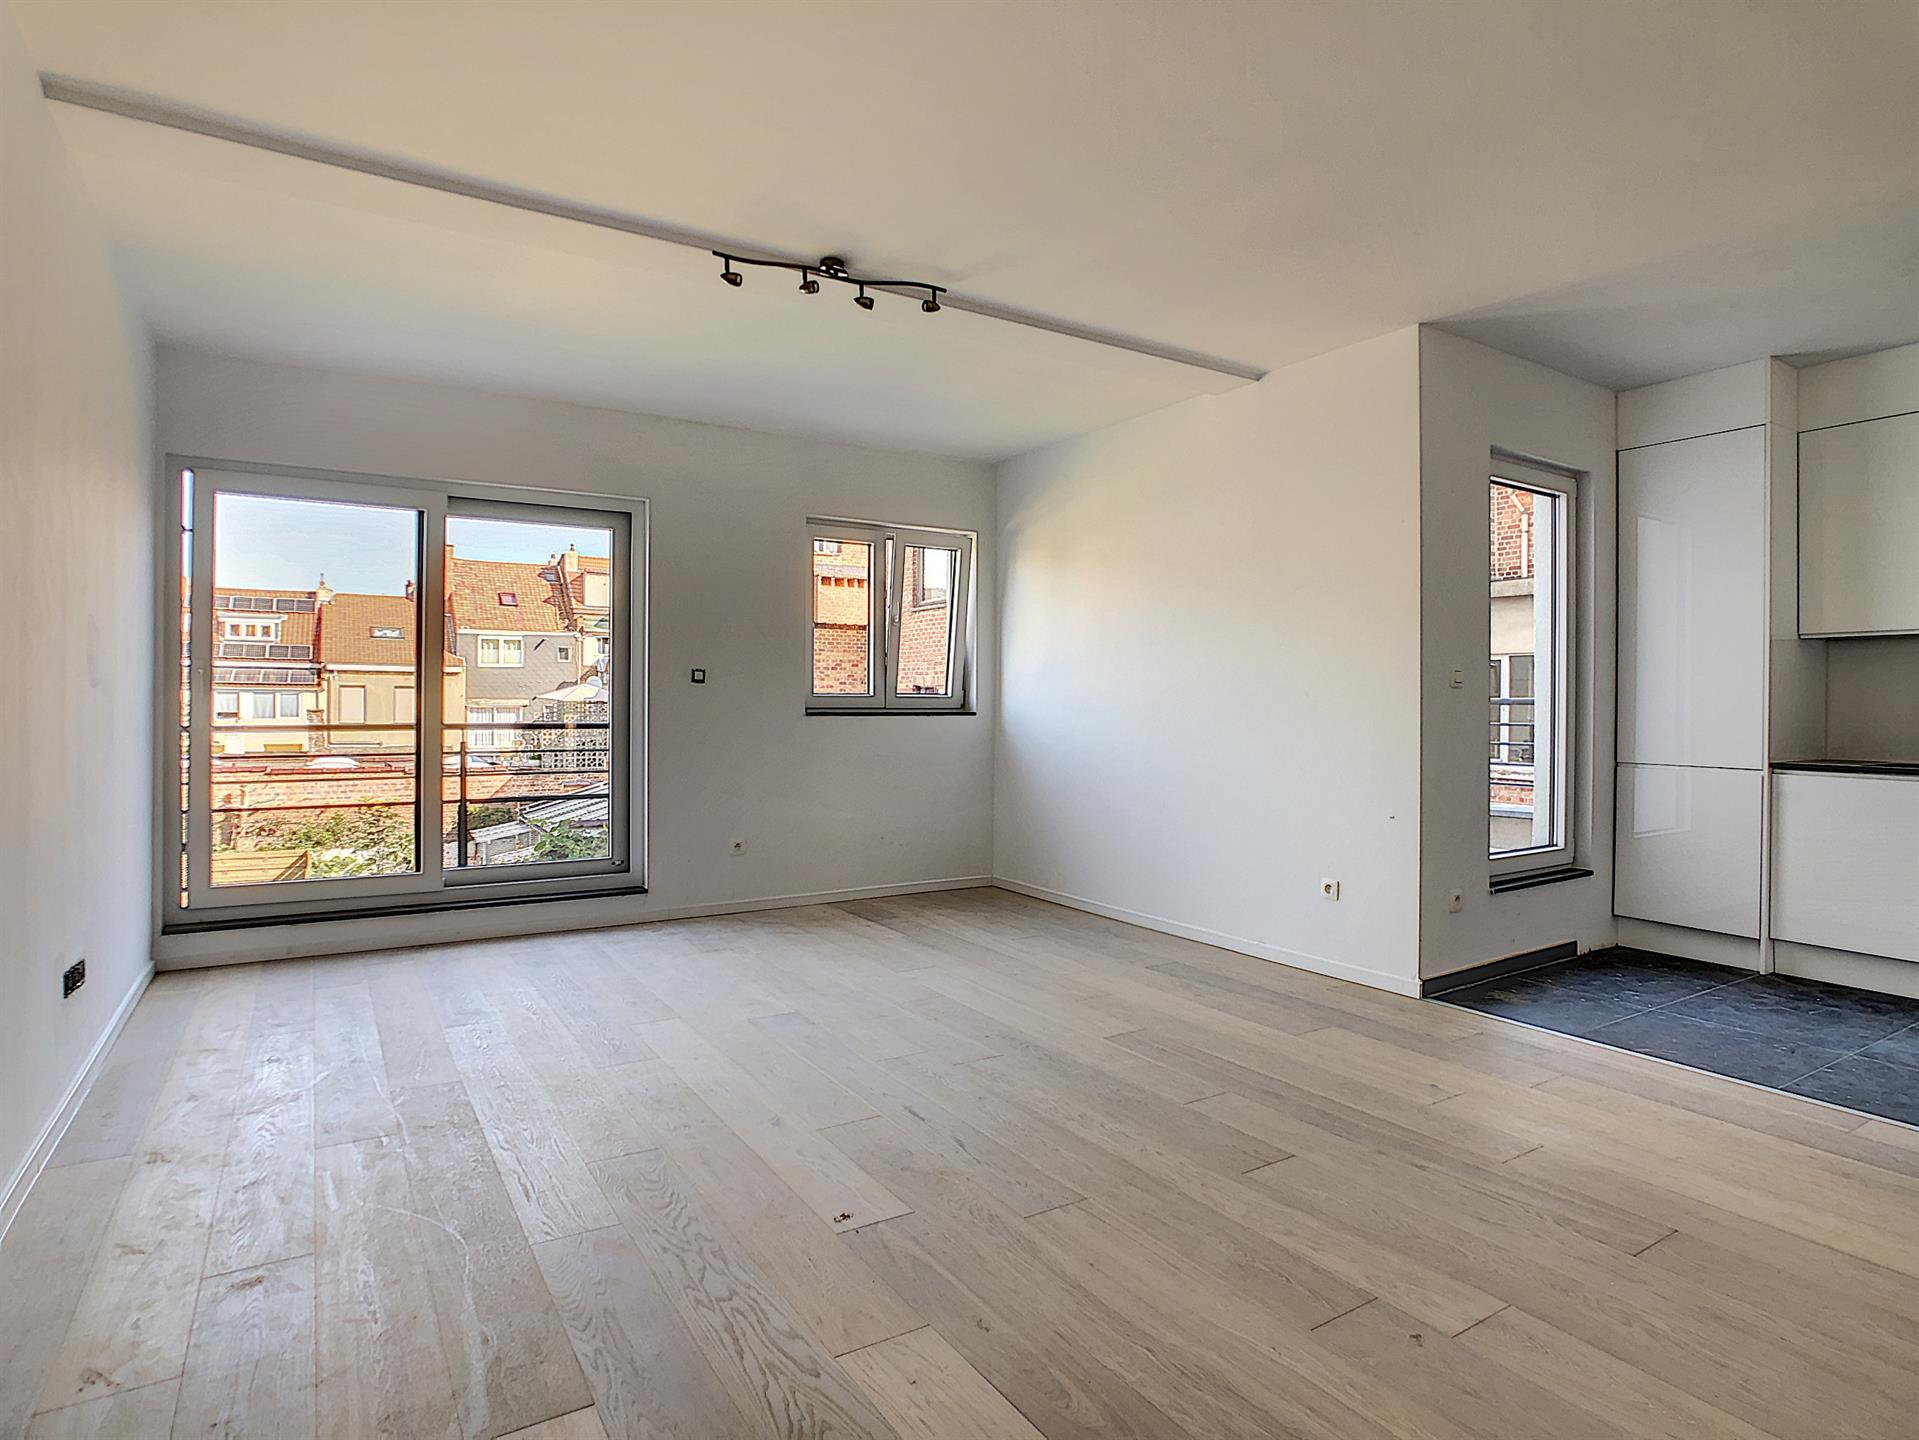 Appartement - Anderlecht - #4252376-4